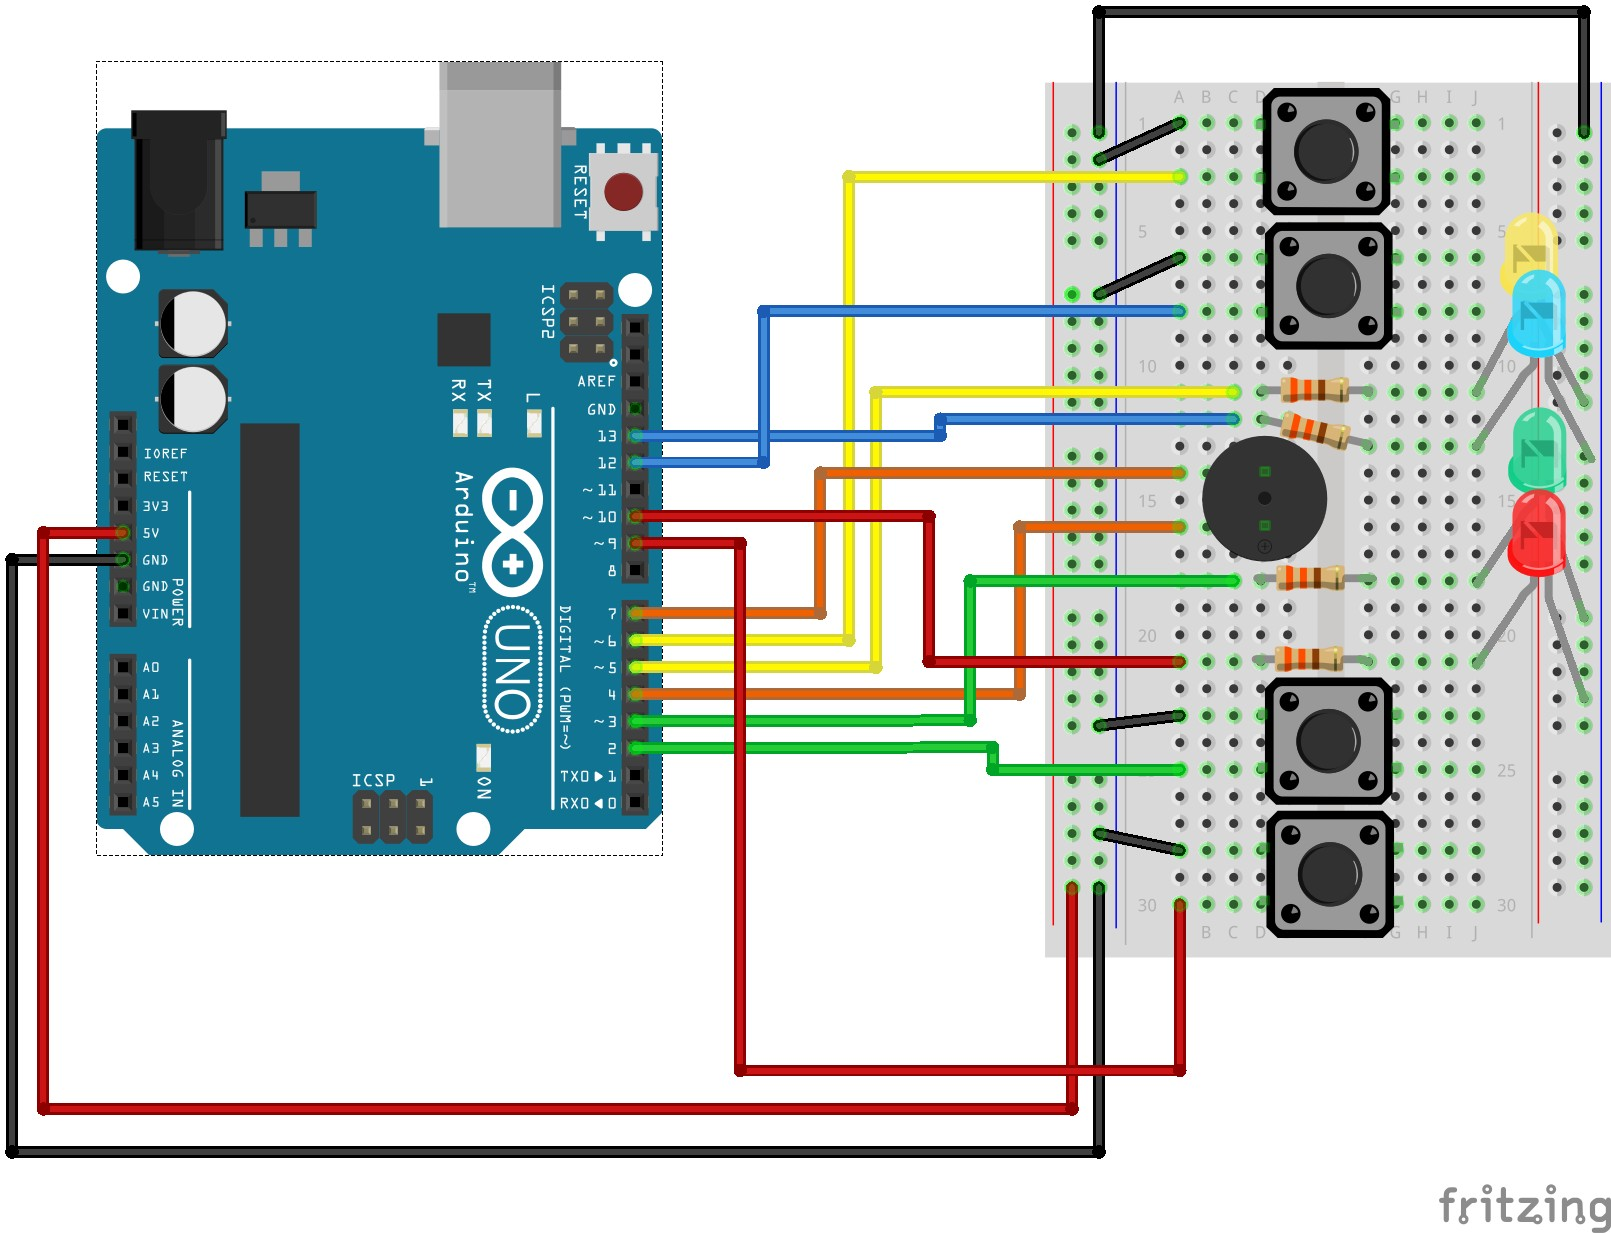 2ftmp2f71e6c3e8 d0ac 4327 8421 bb3ac7d farduino circuit 16 01 G1RUn5Lsu3